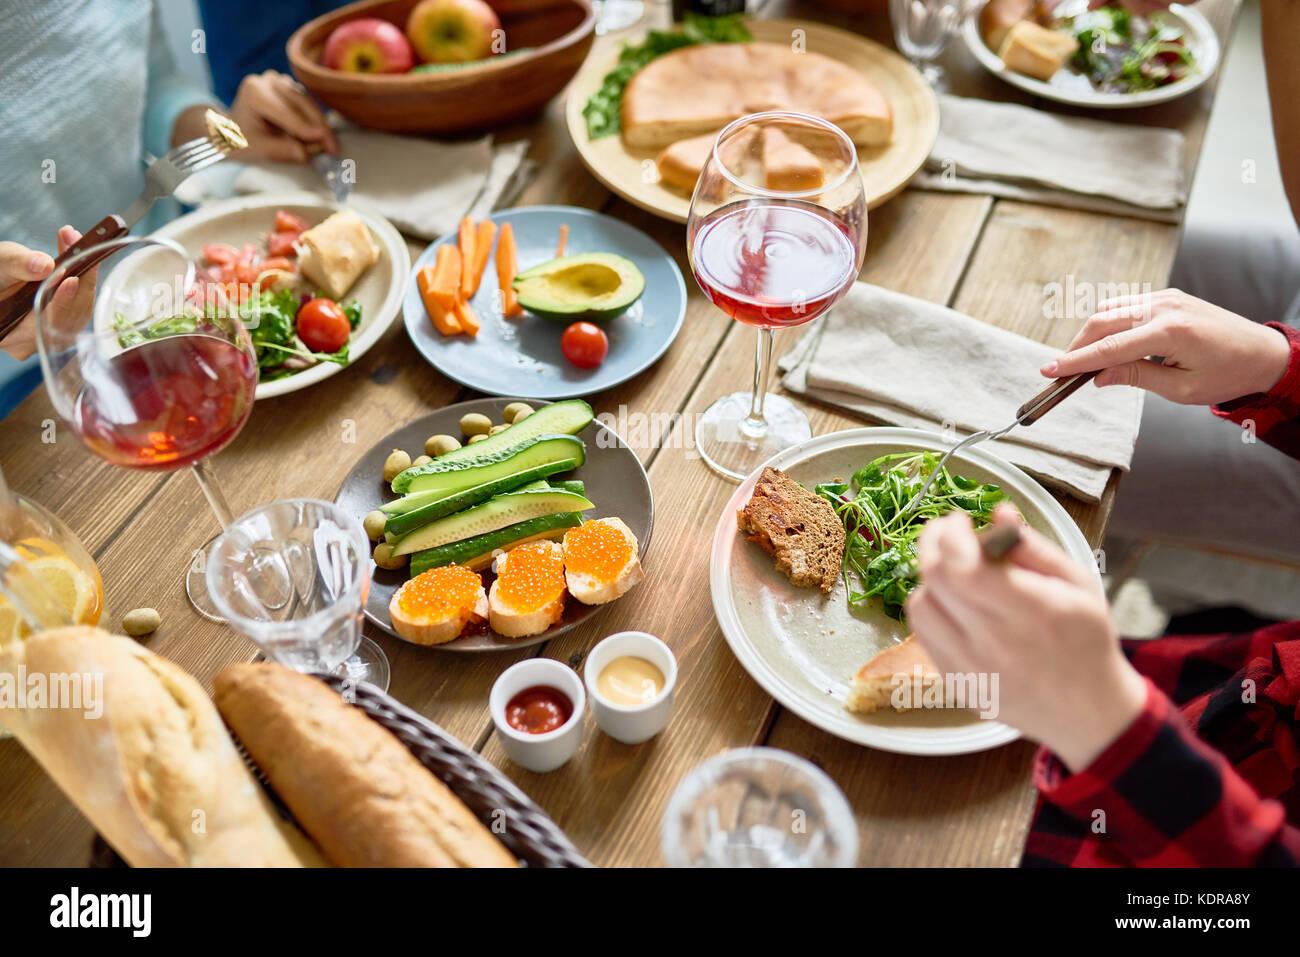 People Enjoying Delicious Dinner - Stock Image